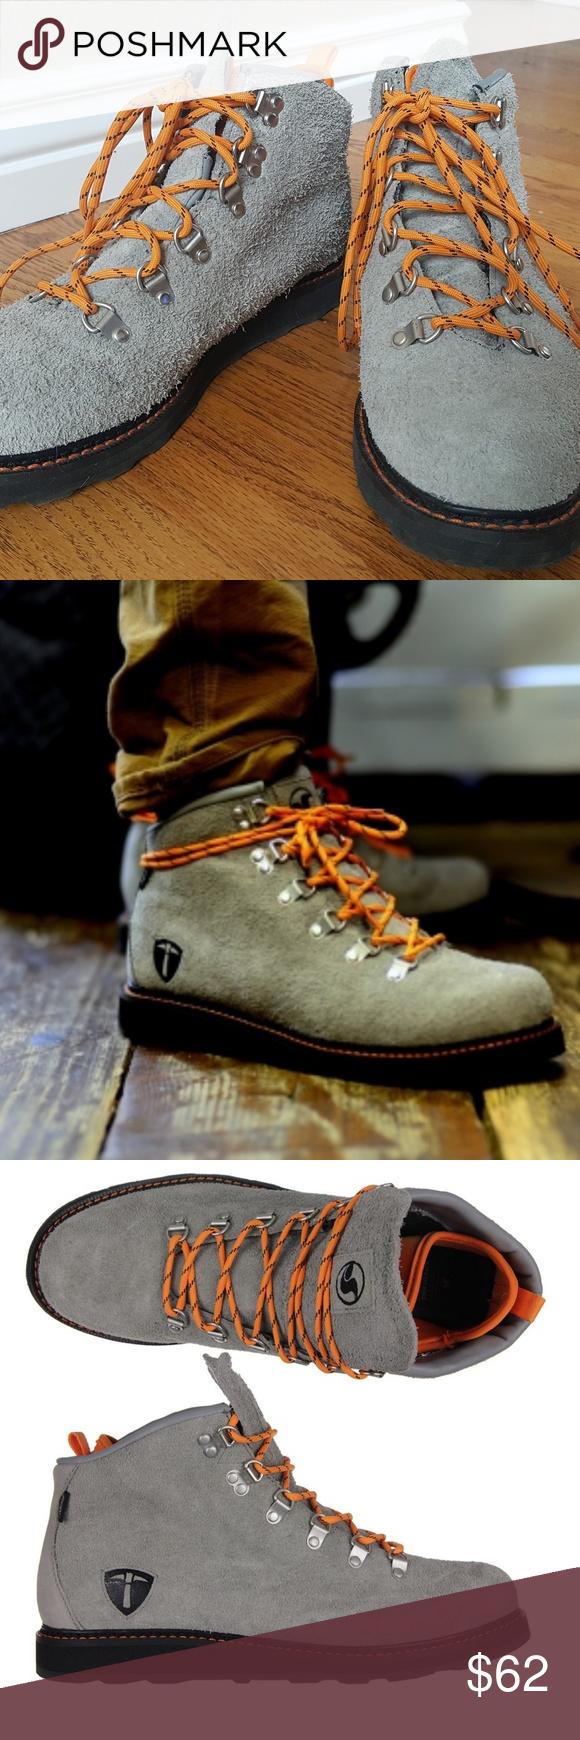 814f7c80438 DVS Mens Yodeler Skate Shoes Ankle Boots Solid shoe! Grey leather ...